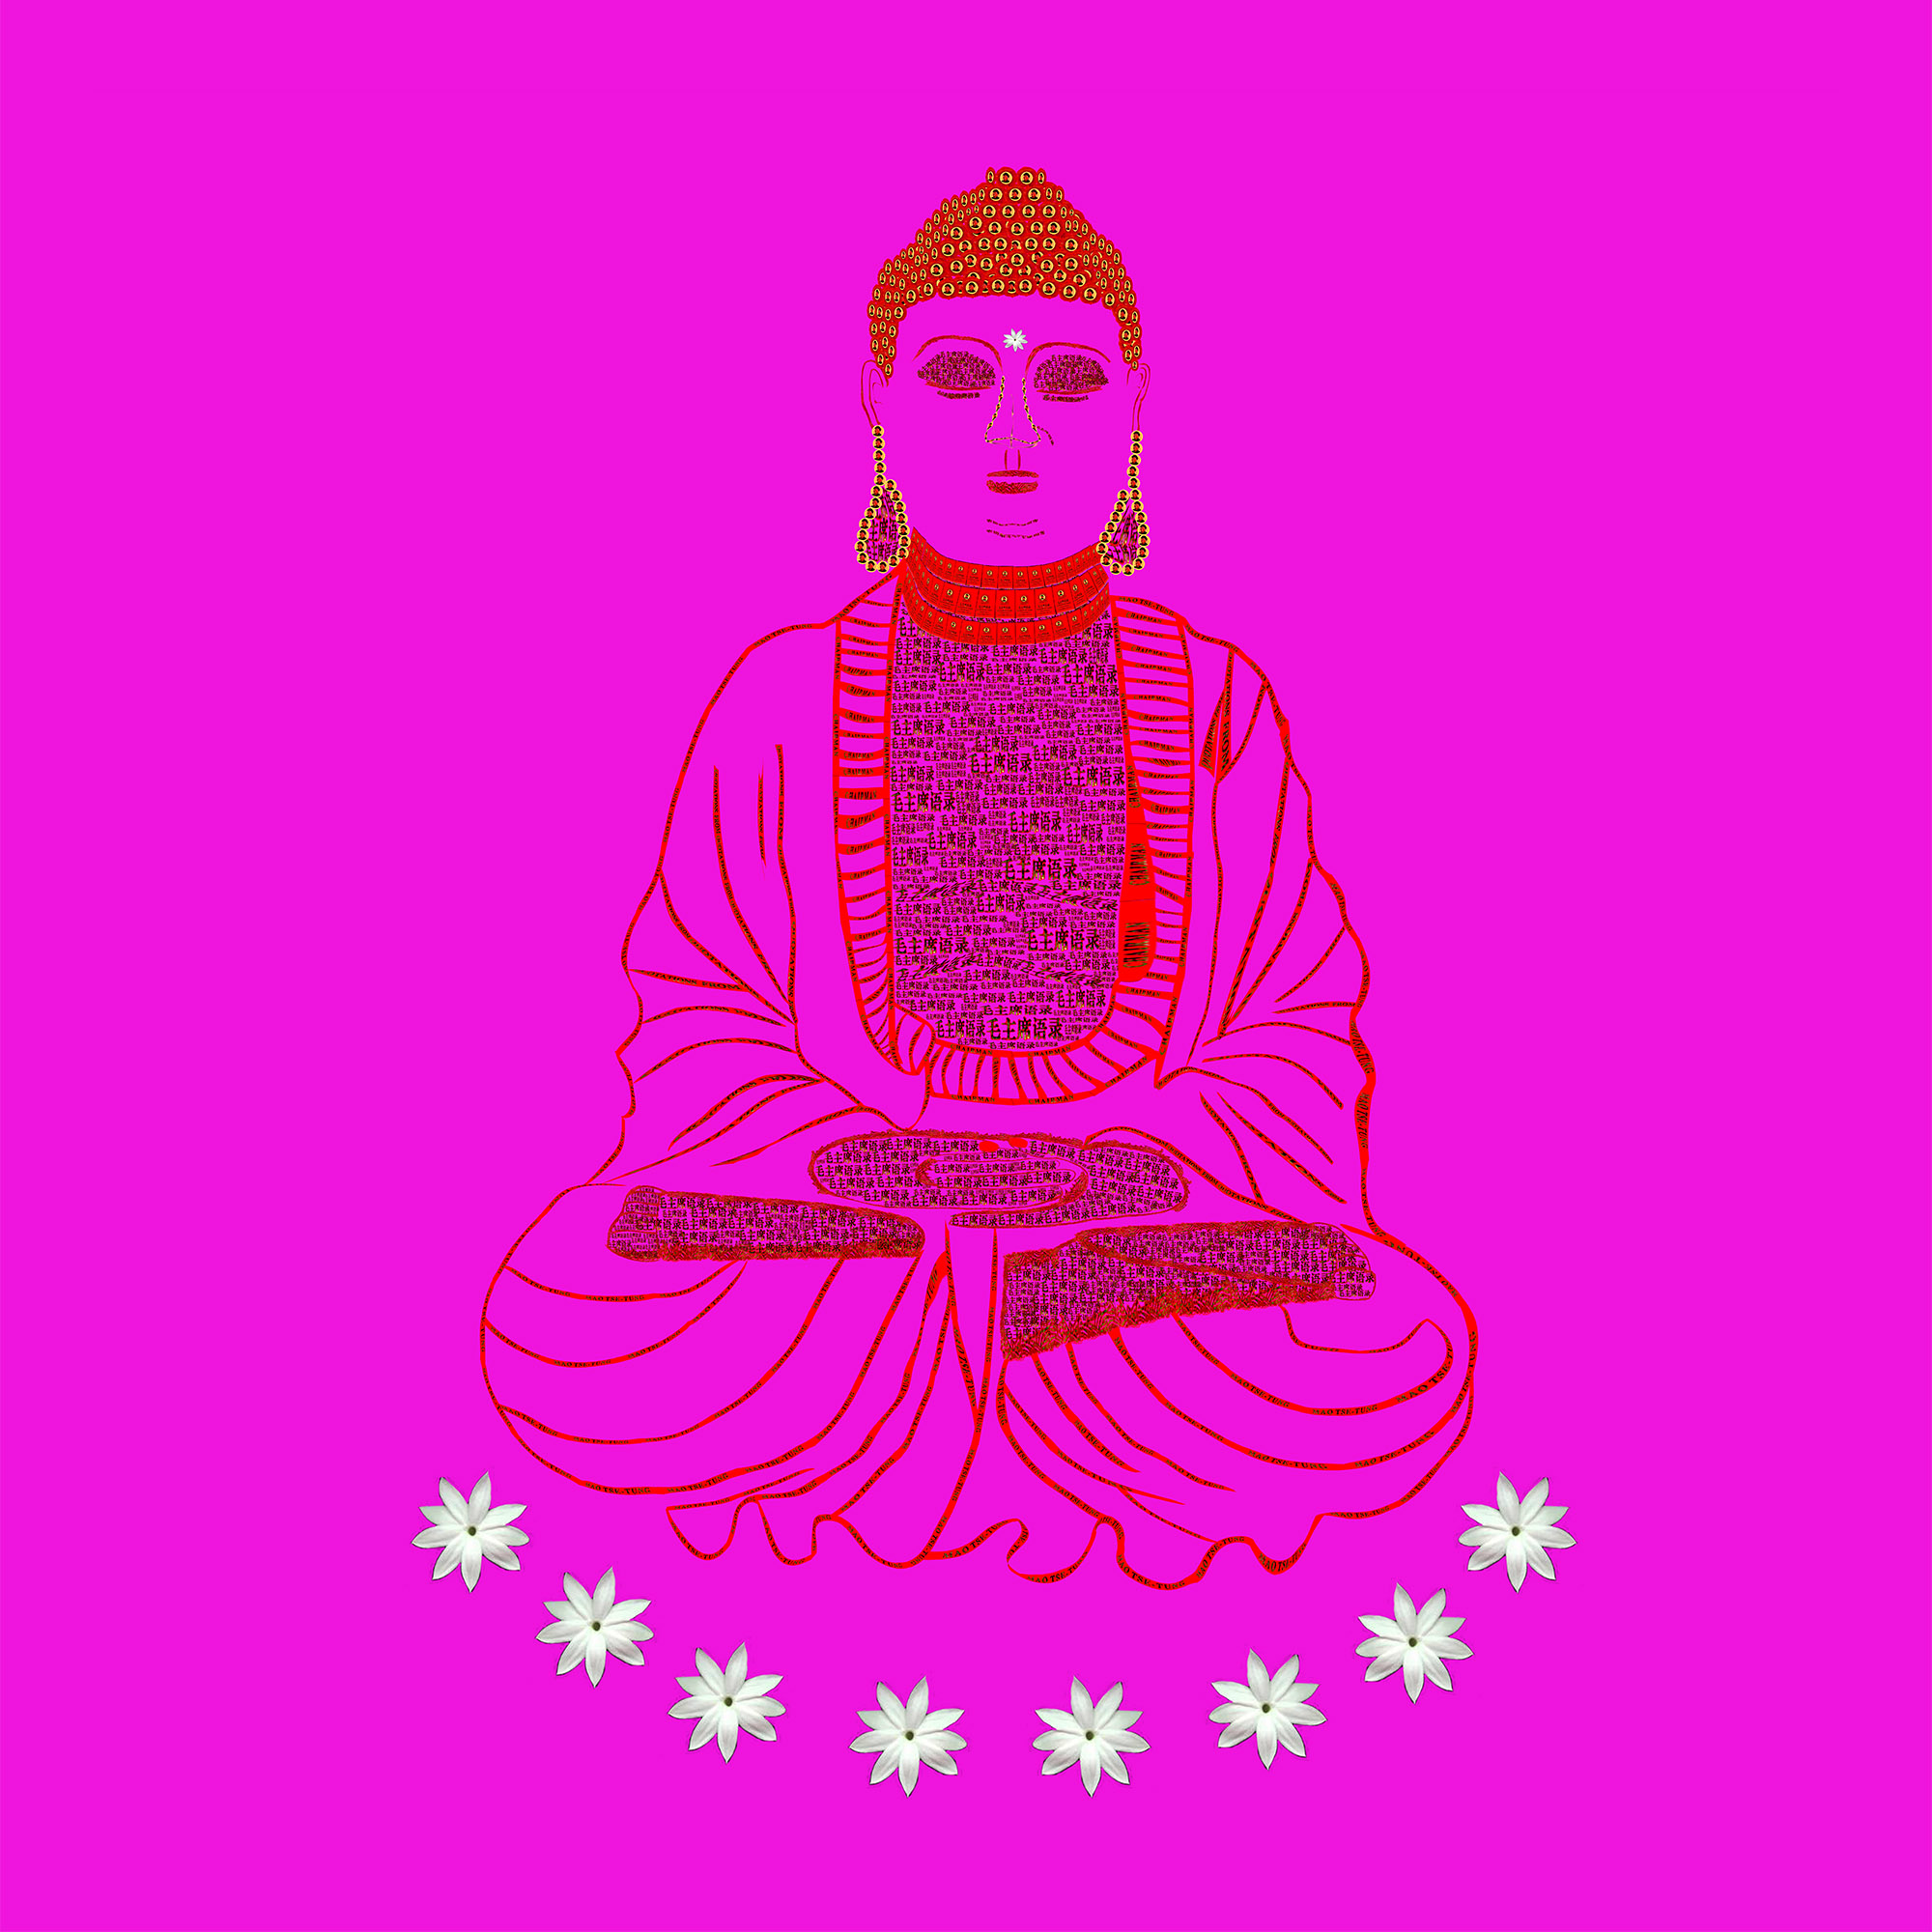 Red Book Buddha - Pink